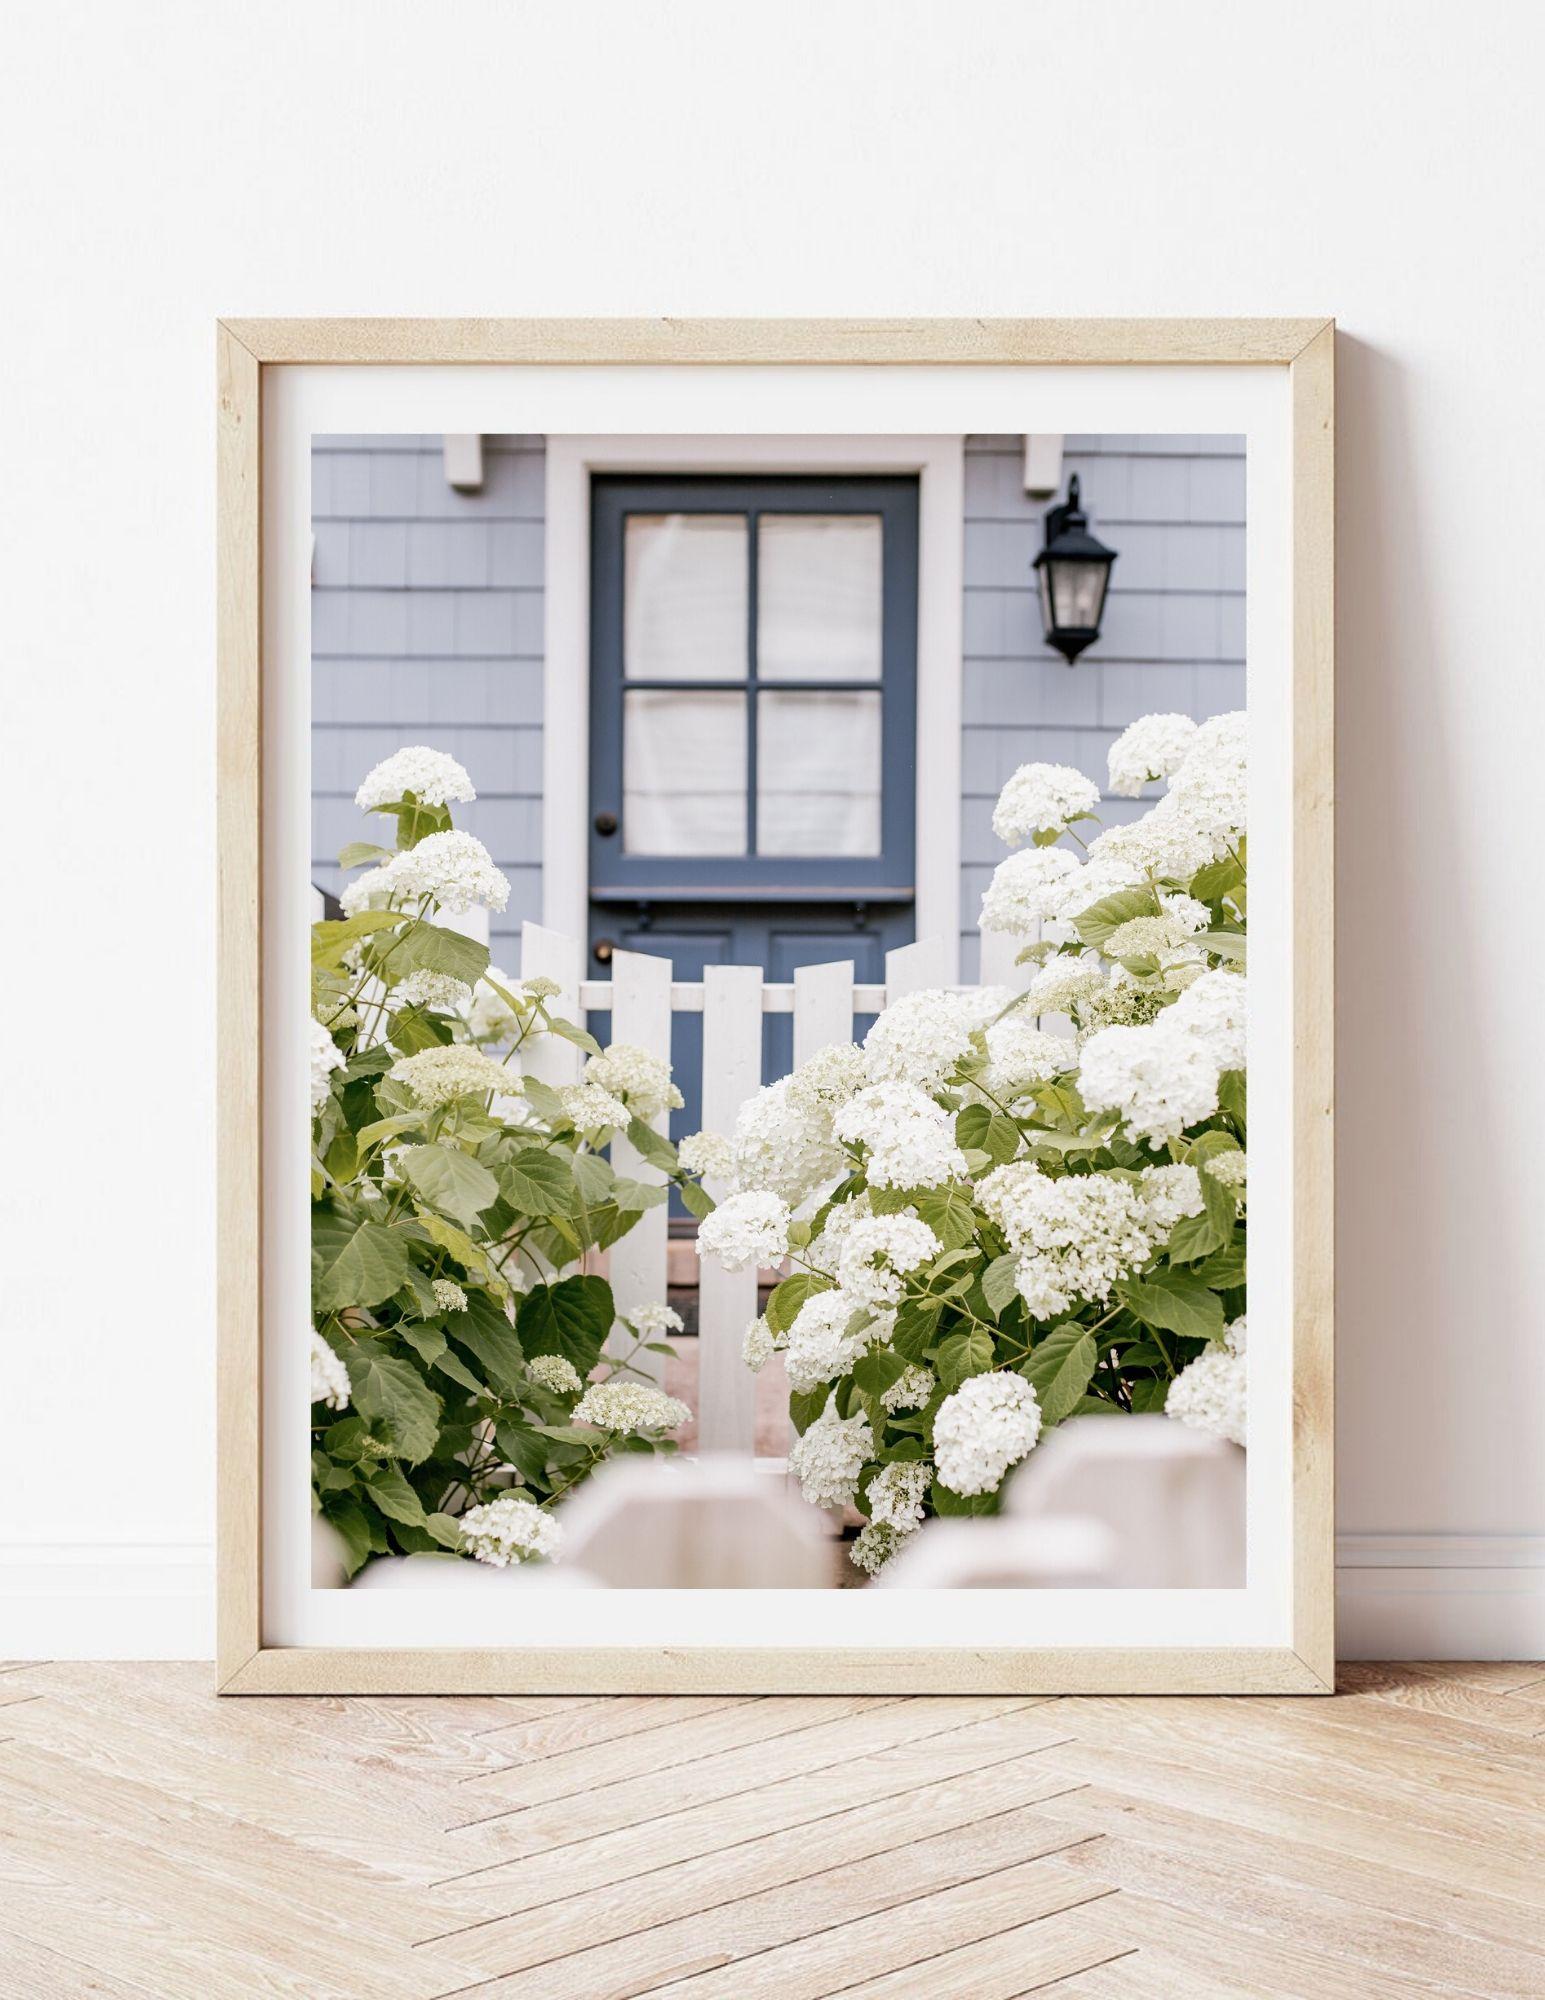 Louella Reese Etsy Shop | Wall Art, Gallery Wall Prints | White Hydrangea Print, Charming Cottage Print | Louella Reese